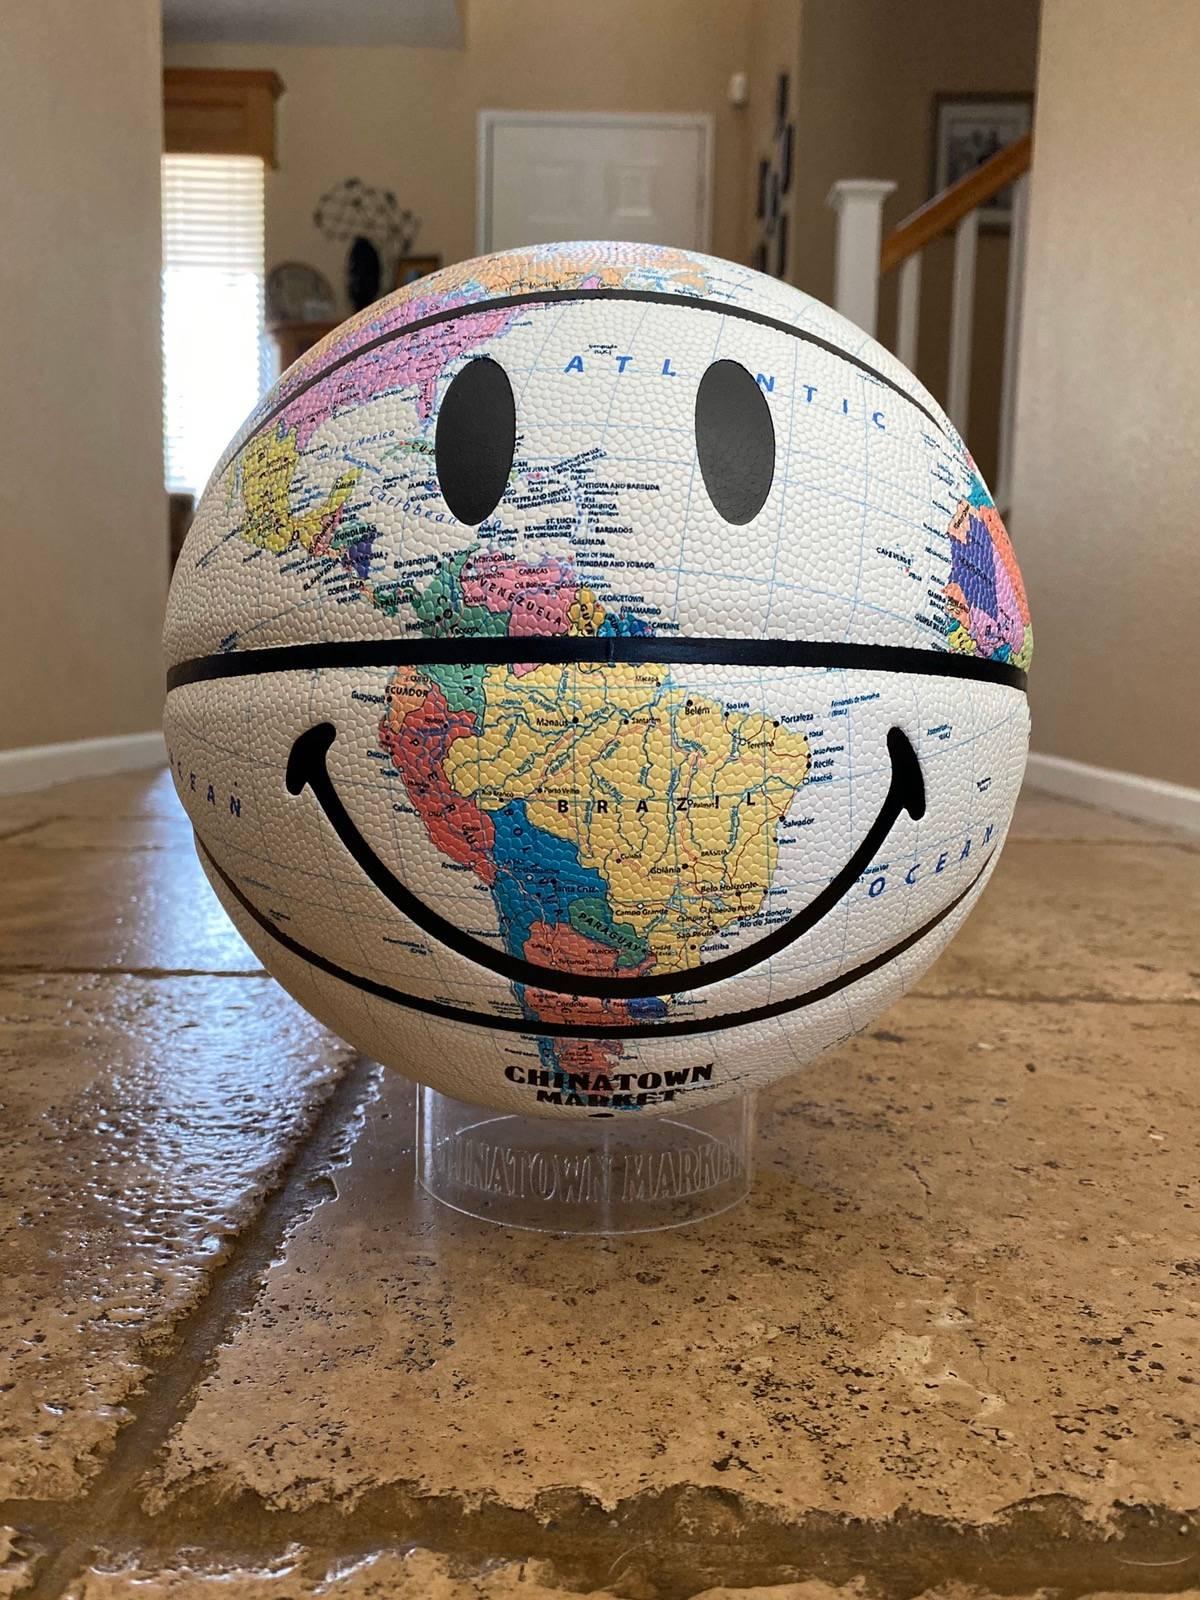 Chinatown Market Smiley Globe Basketball